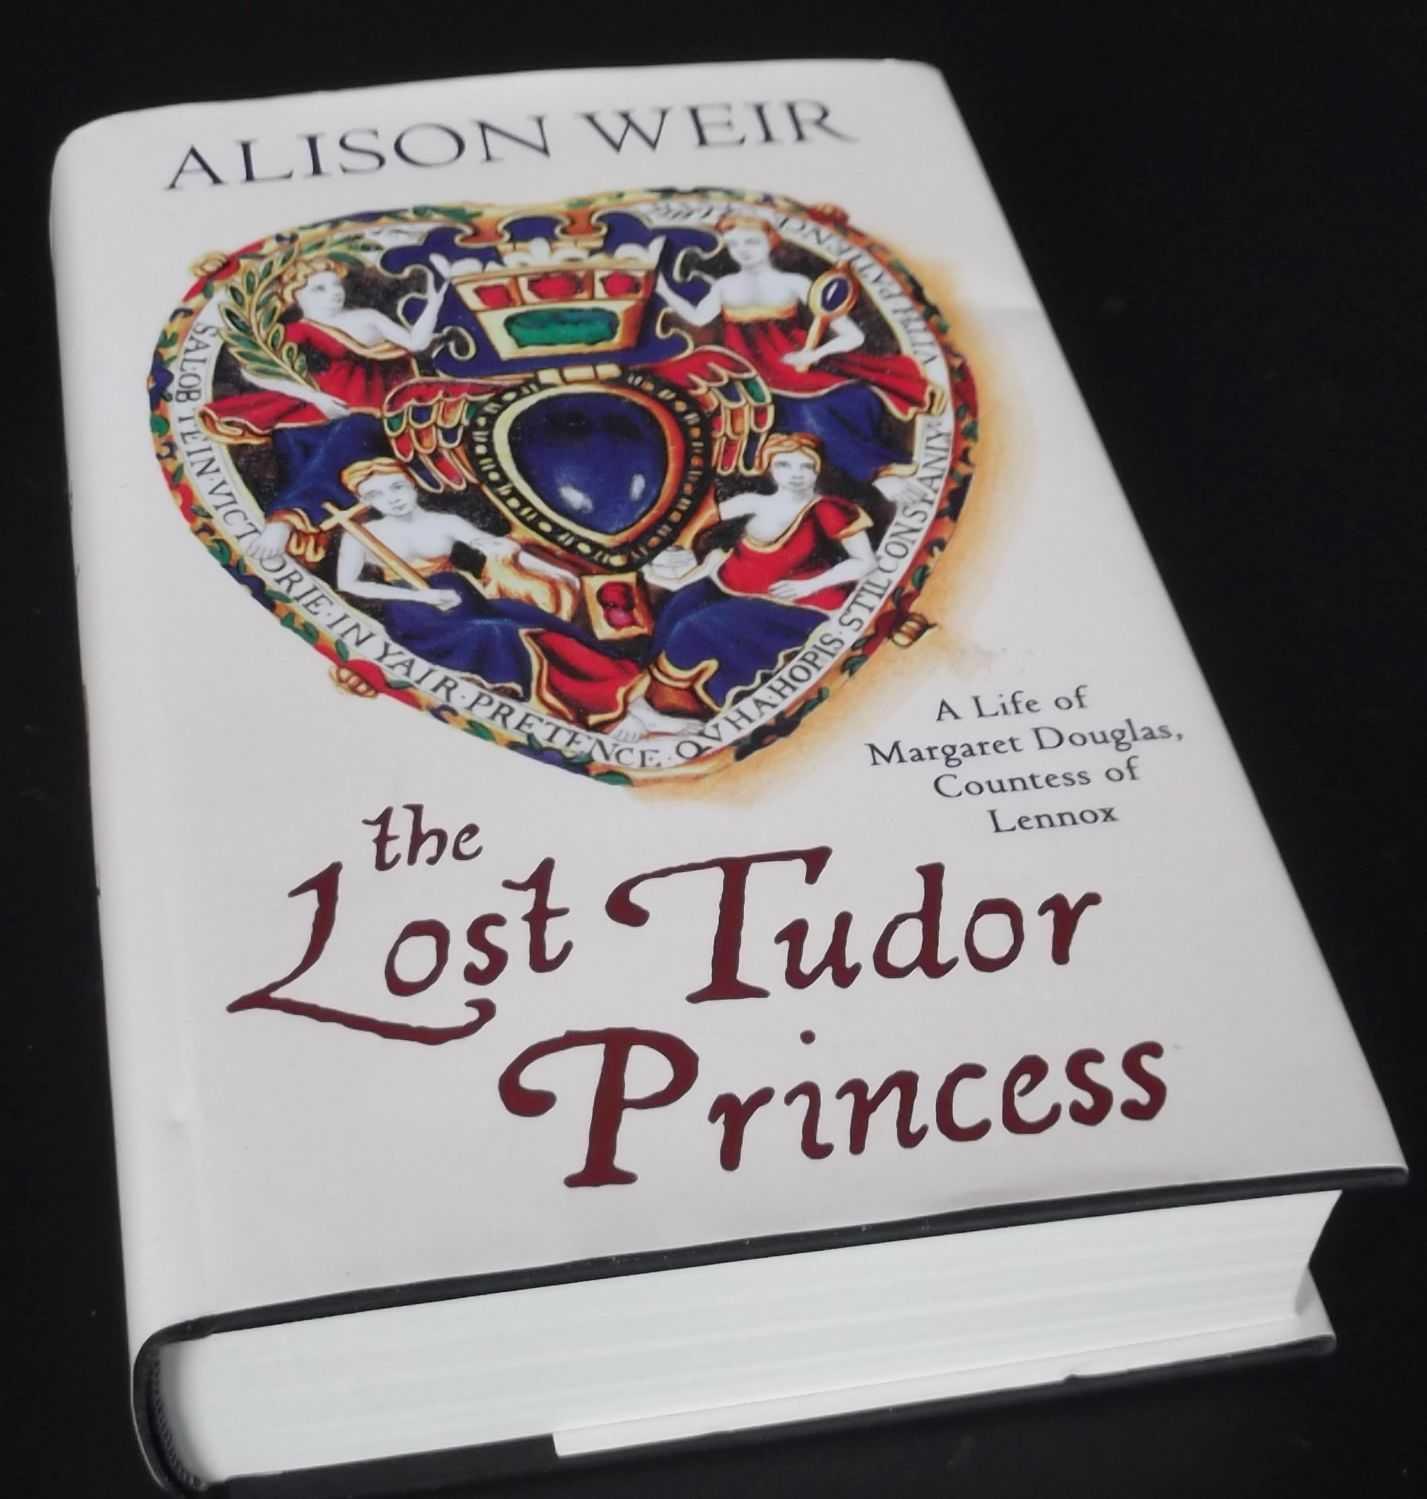 ALISON WEIR - The Lost Tudor Princess: A Life of Margaret Douglas, Countess of Lennox